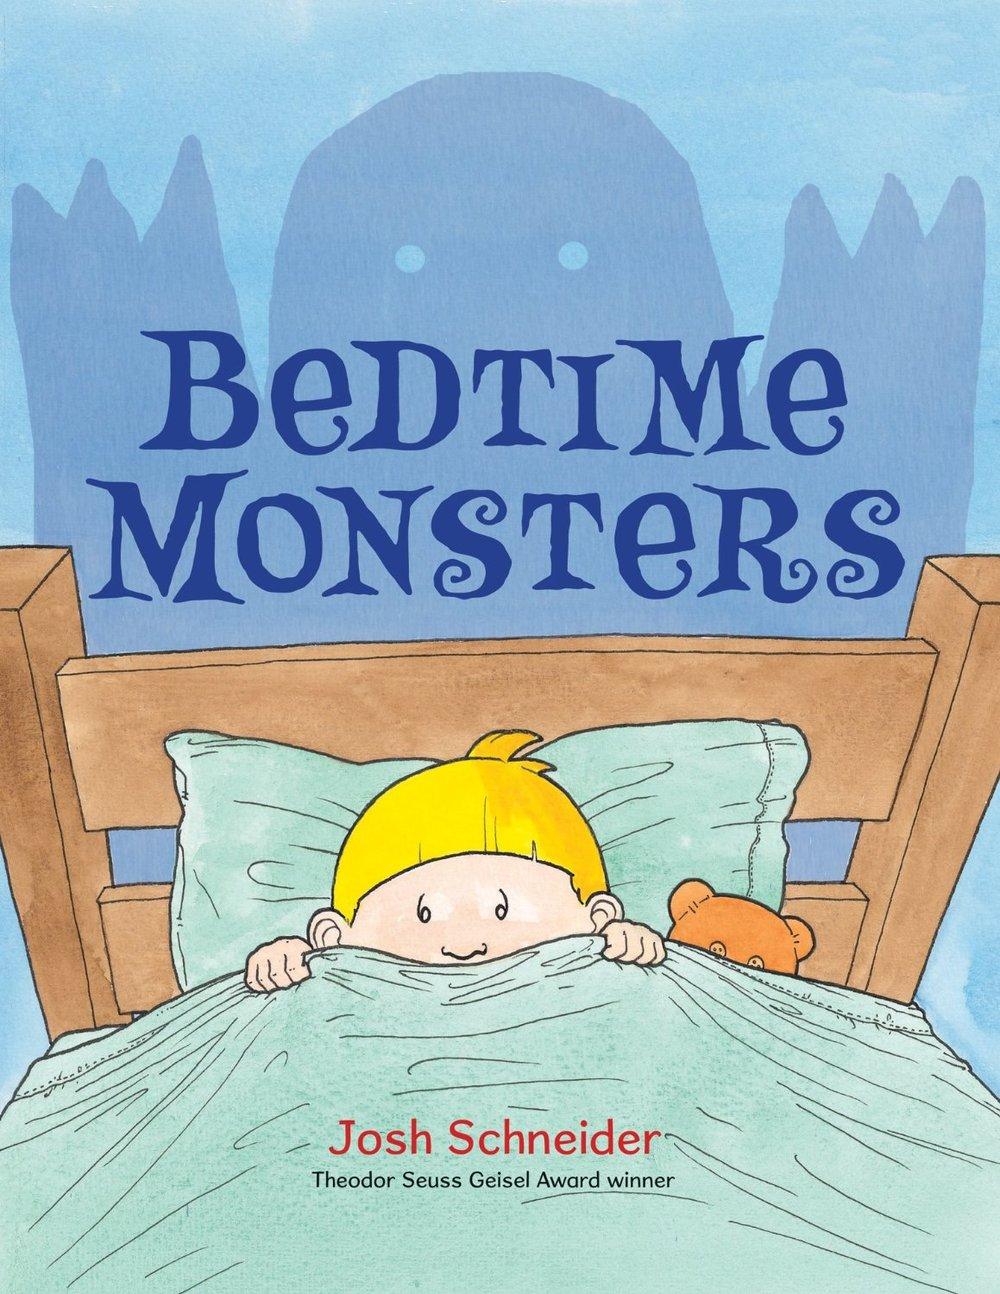 Schneider, Josh 2013_10 - BEDTIME MONSTERS - PB - RLM PR.jpg